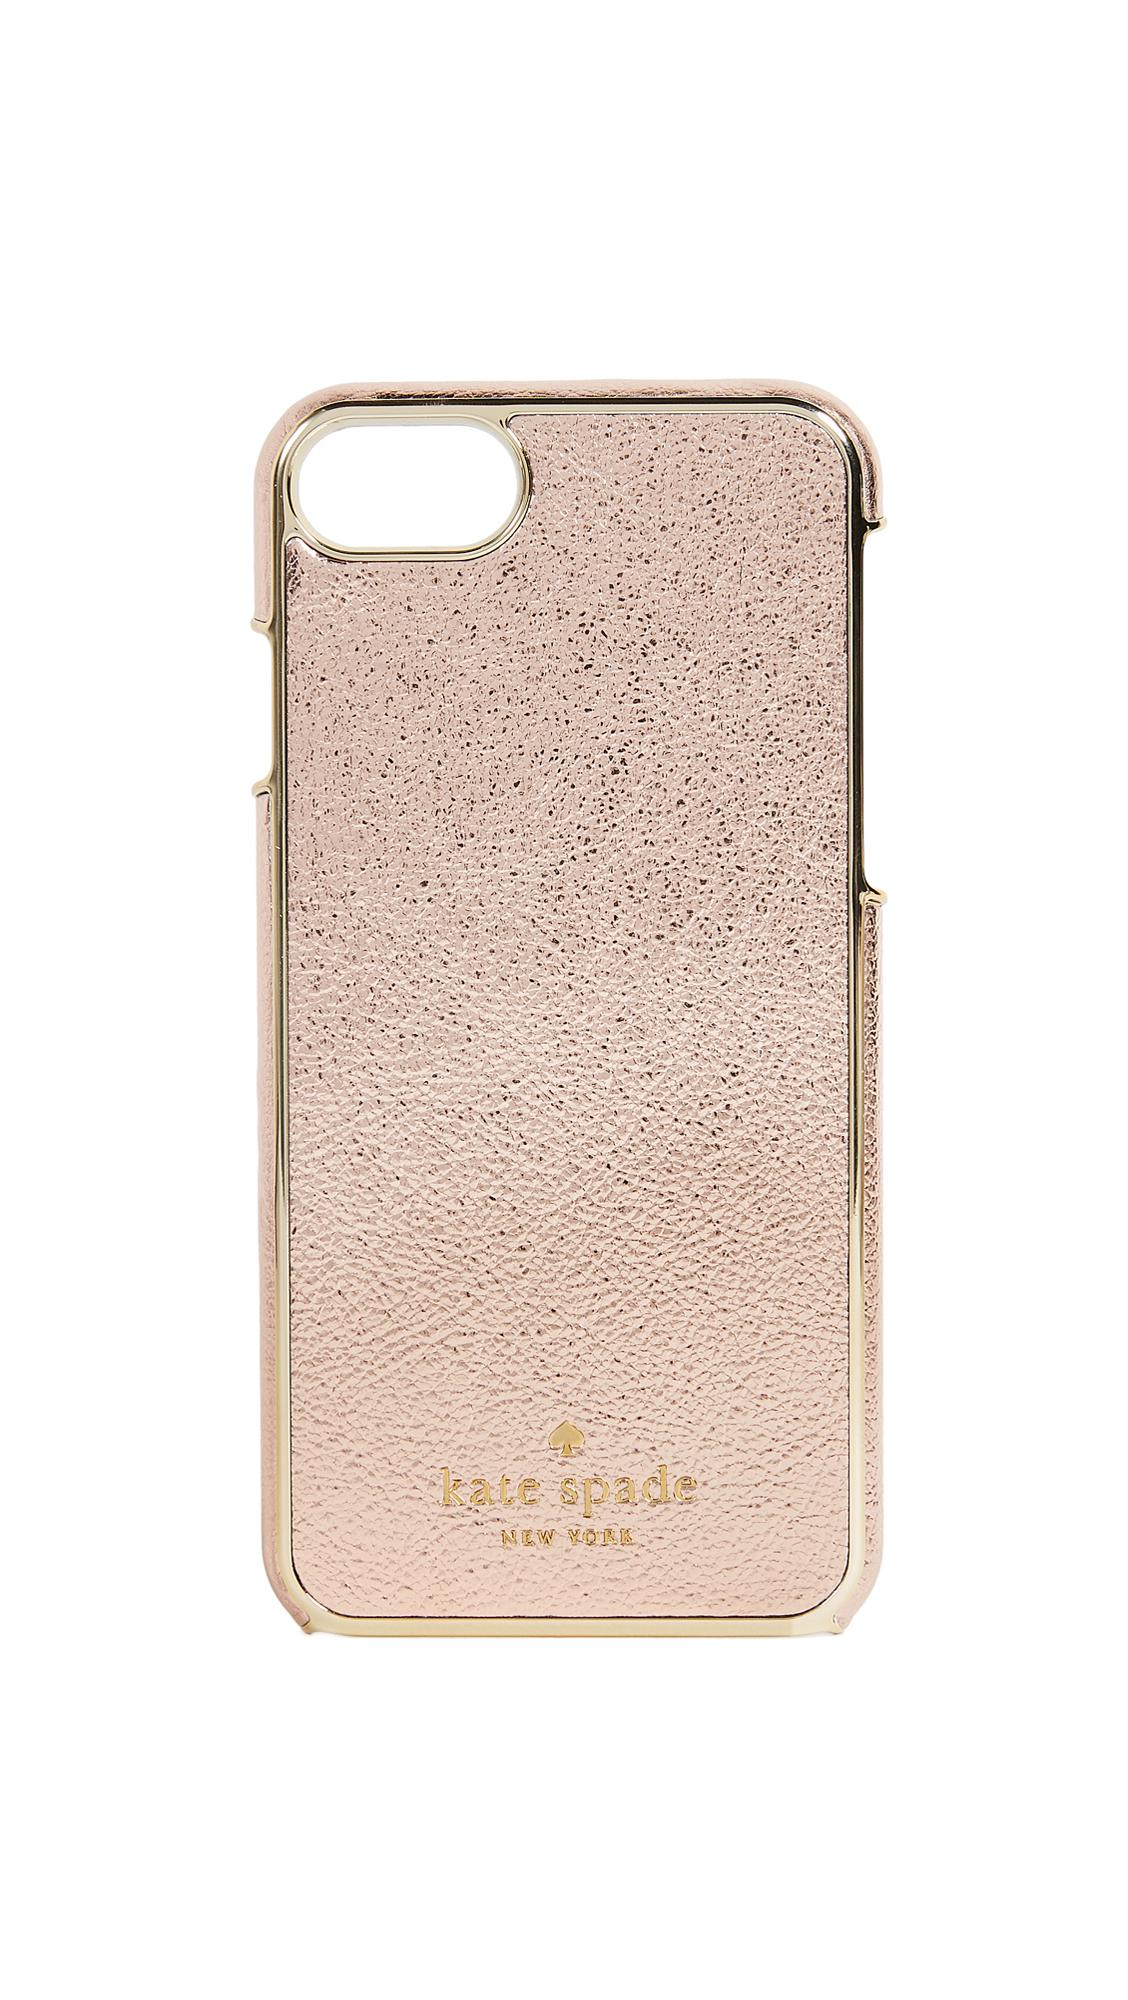 Kate Spade Rose Gold Iphone 7 Case